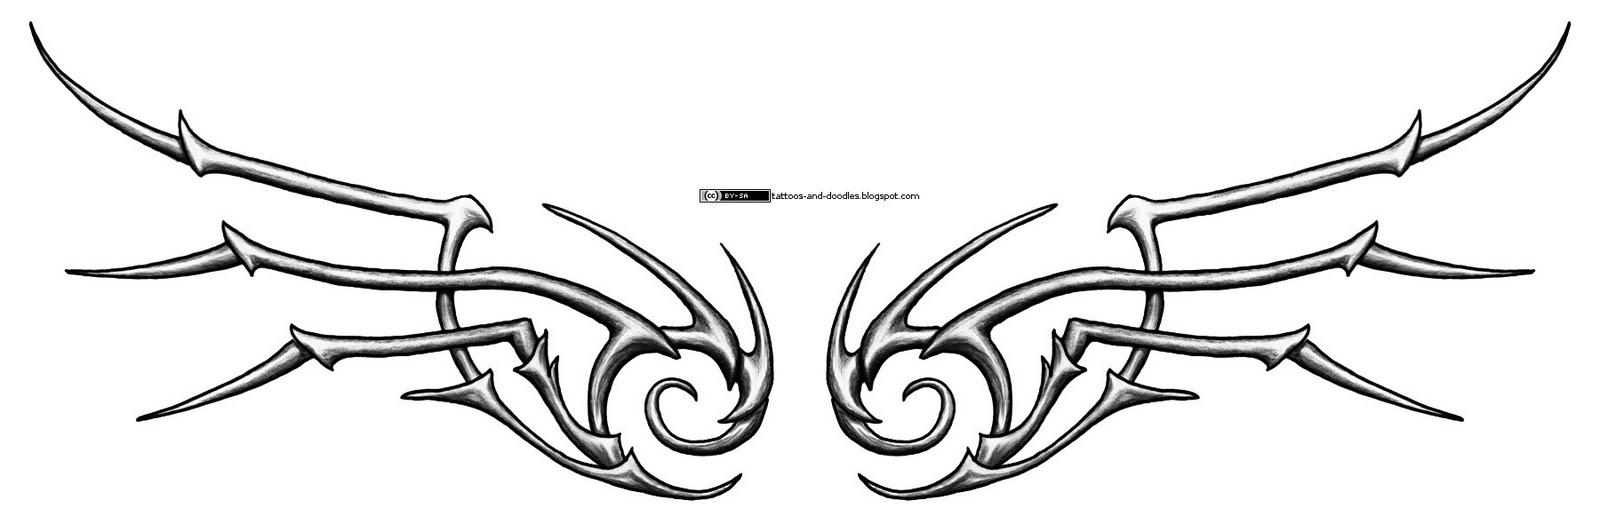 9aac6aebc Tattoos and doodles: Bone tribal wings